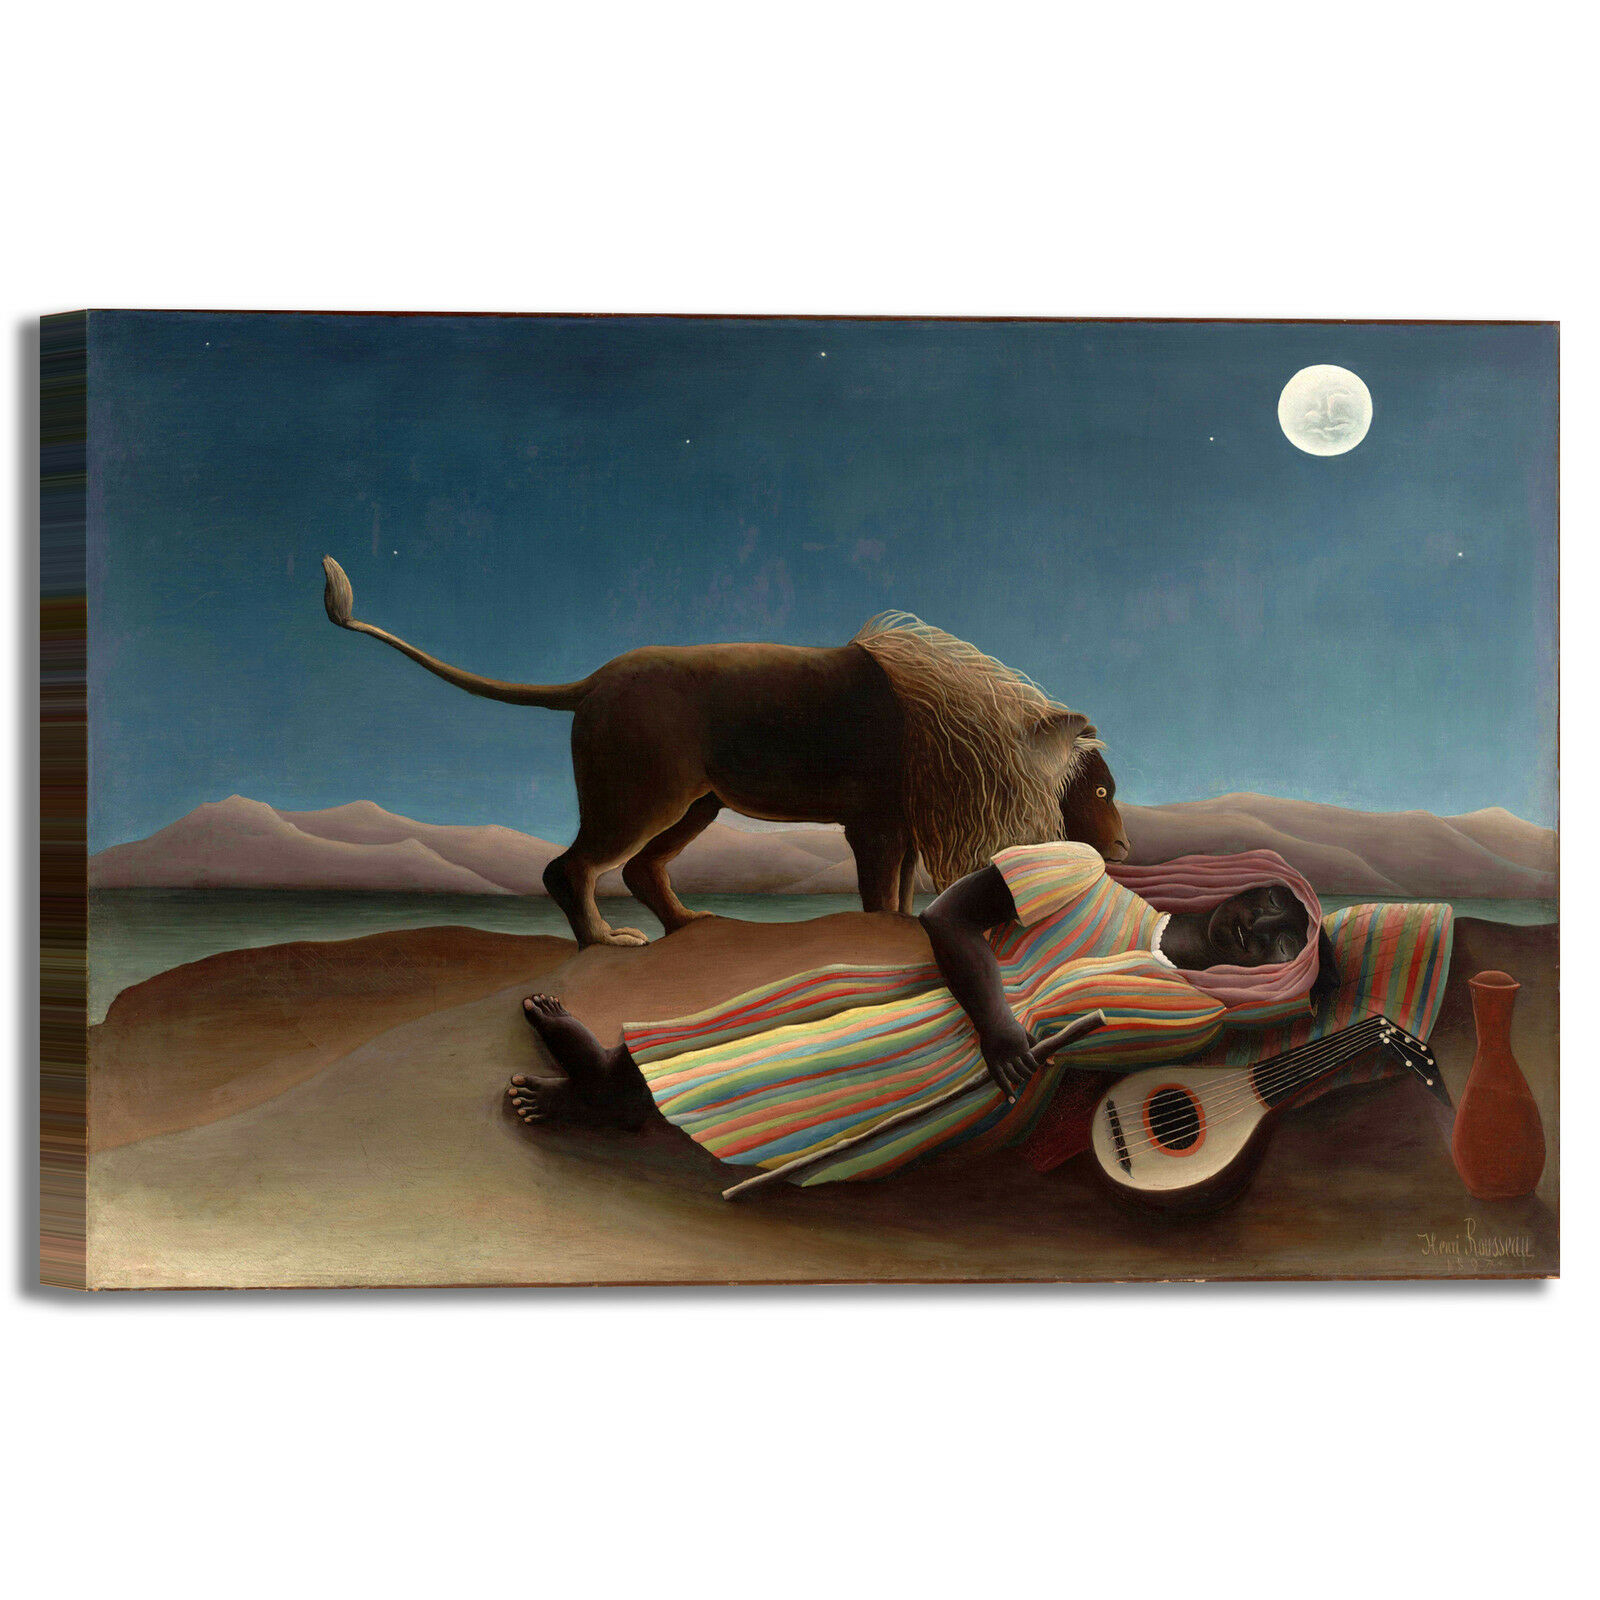 Rousseau zingara addormentata quadro stampa tela dipinto telaio arrossoo casa